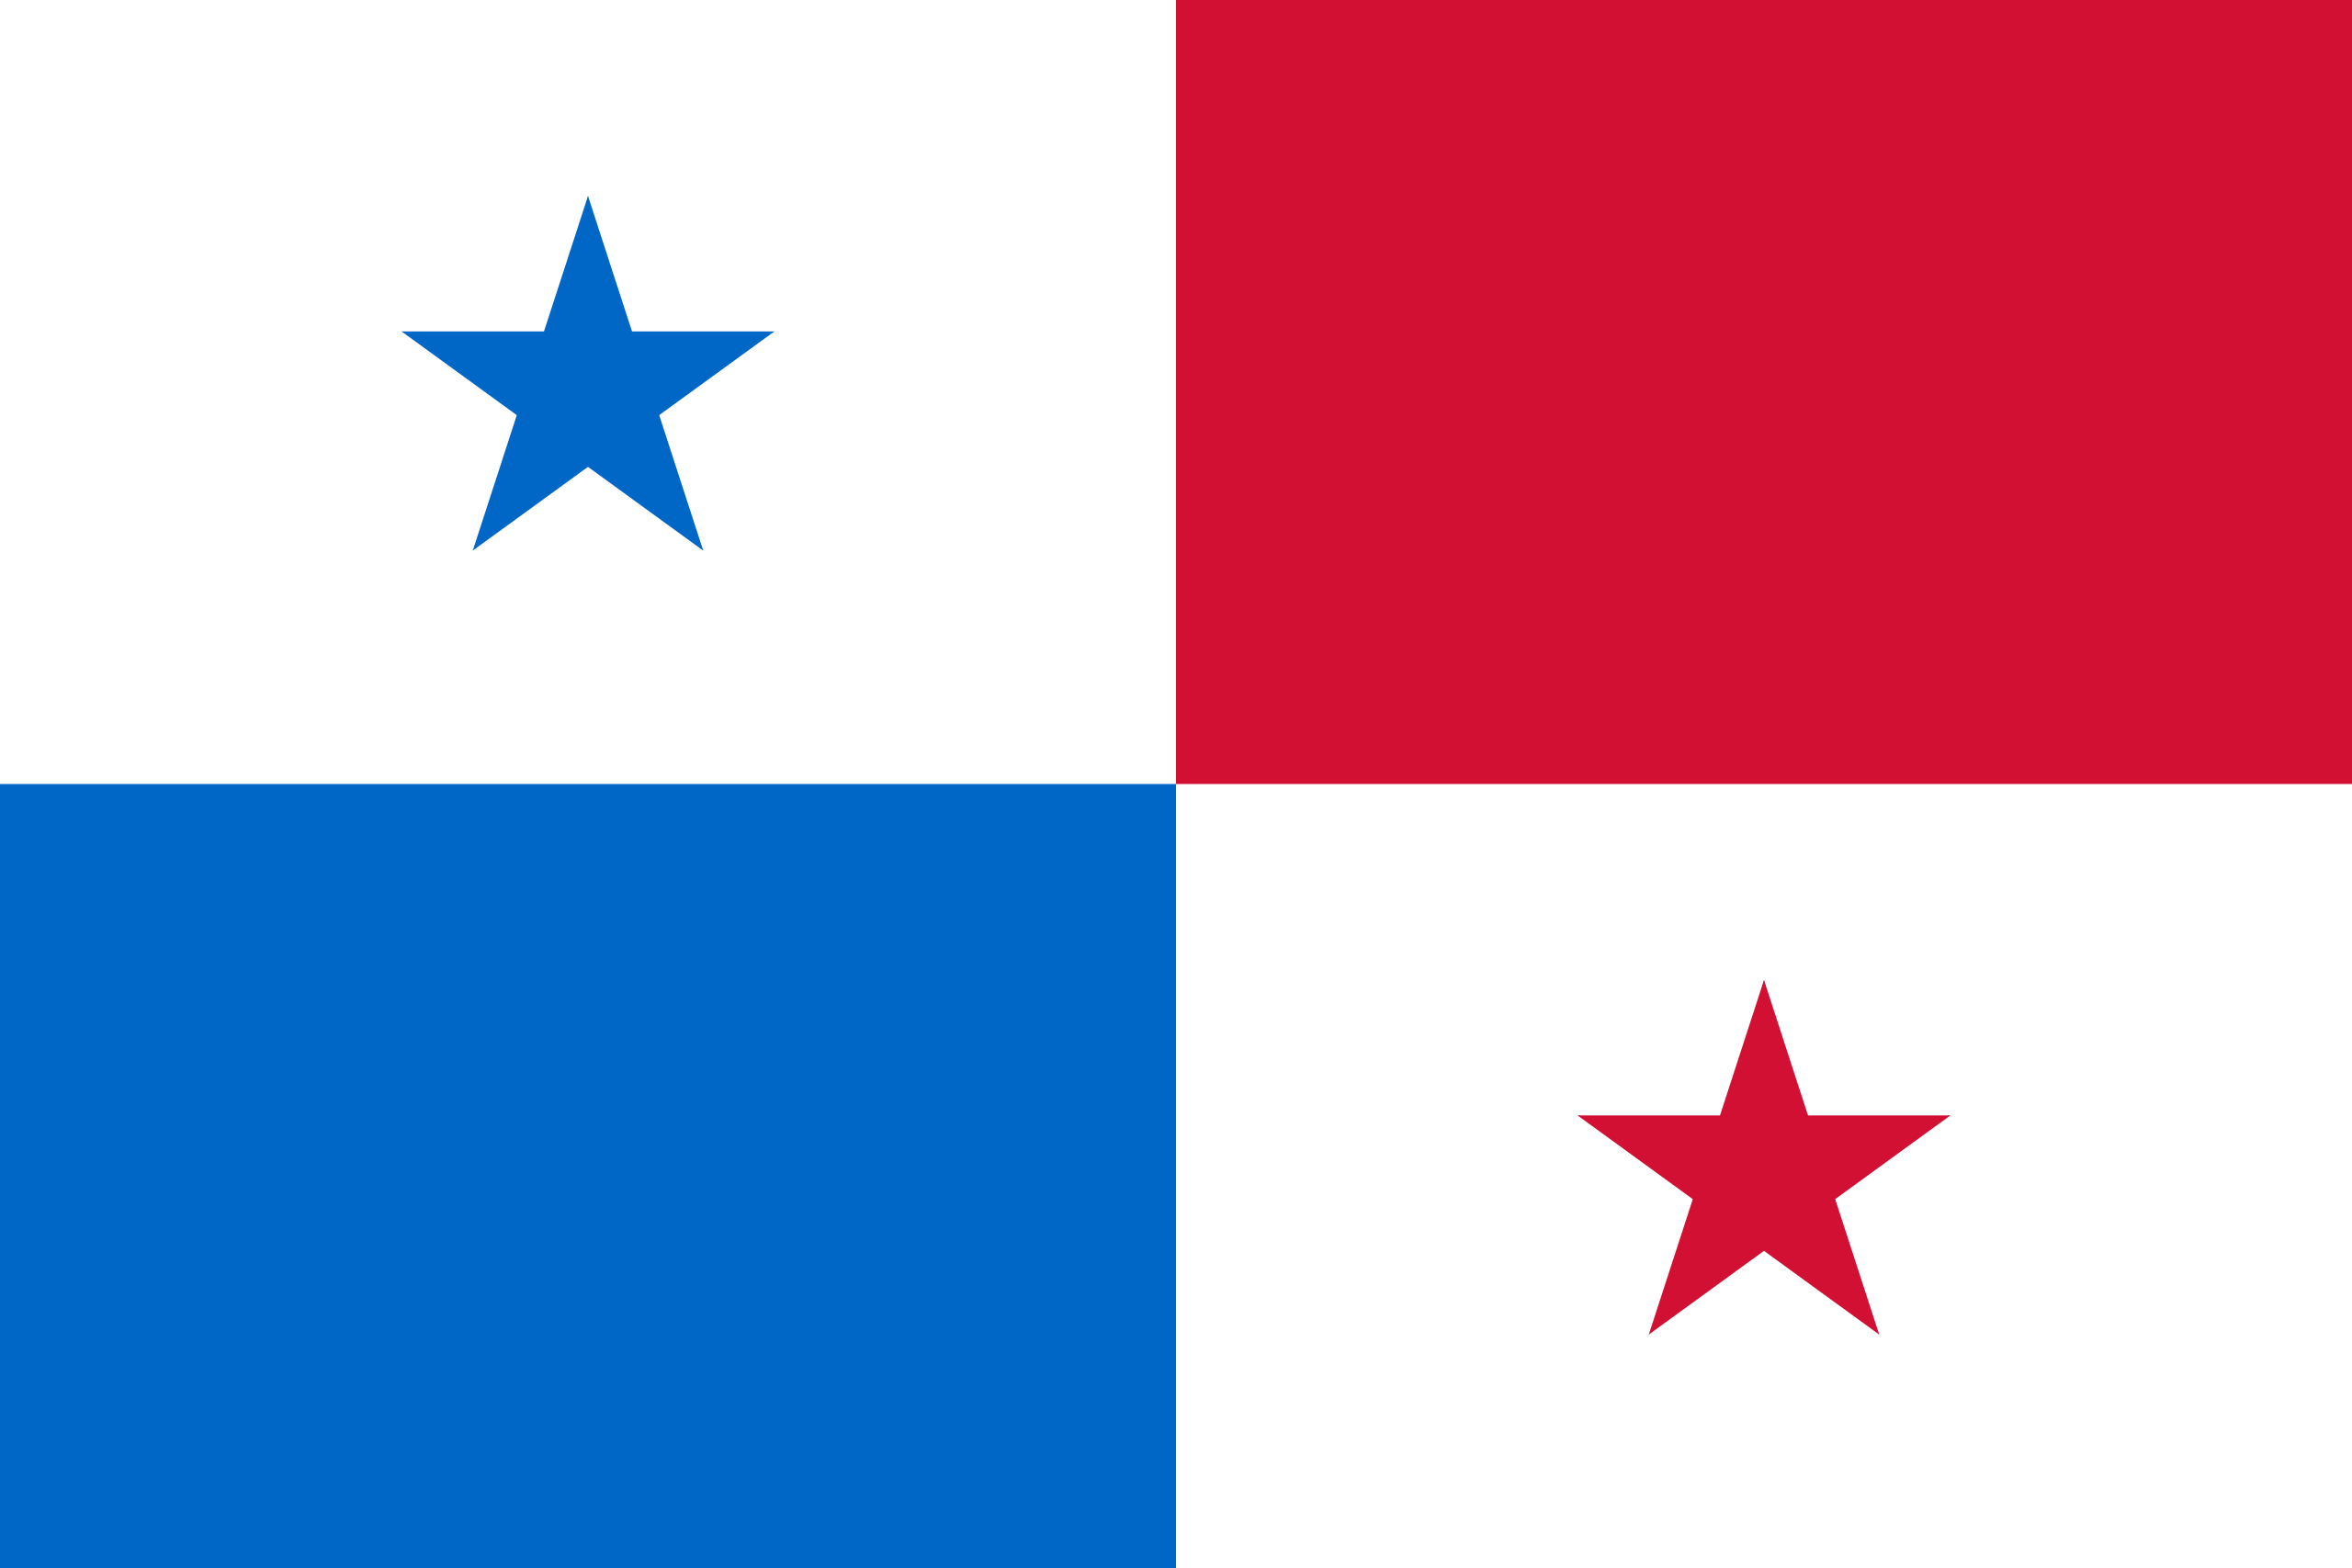 panamá, 国家, 会徽, 徽标, 符号 - 高清壁纸 - 教授-falken.com